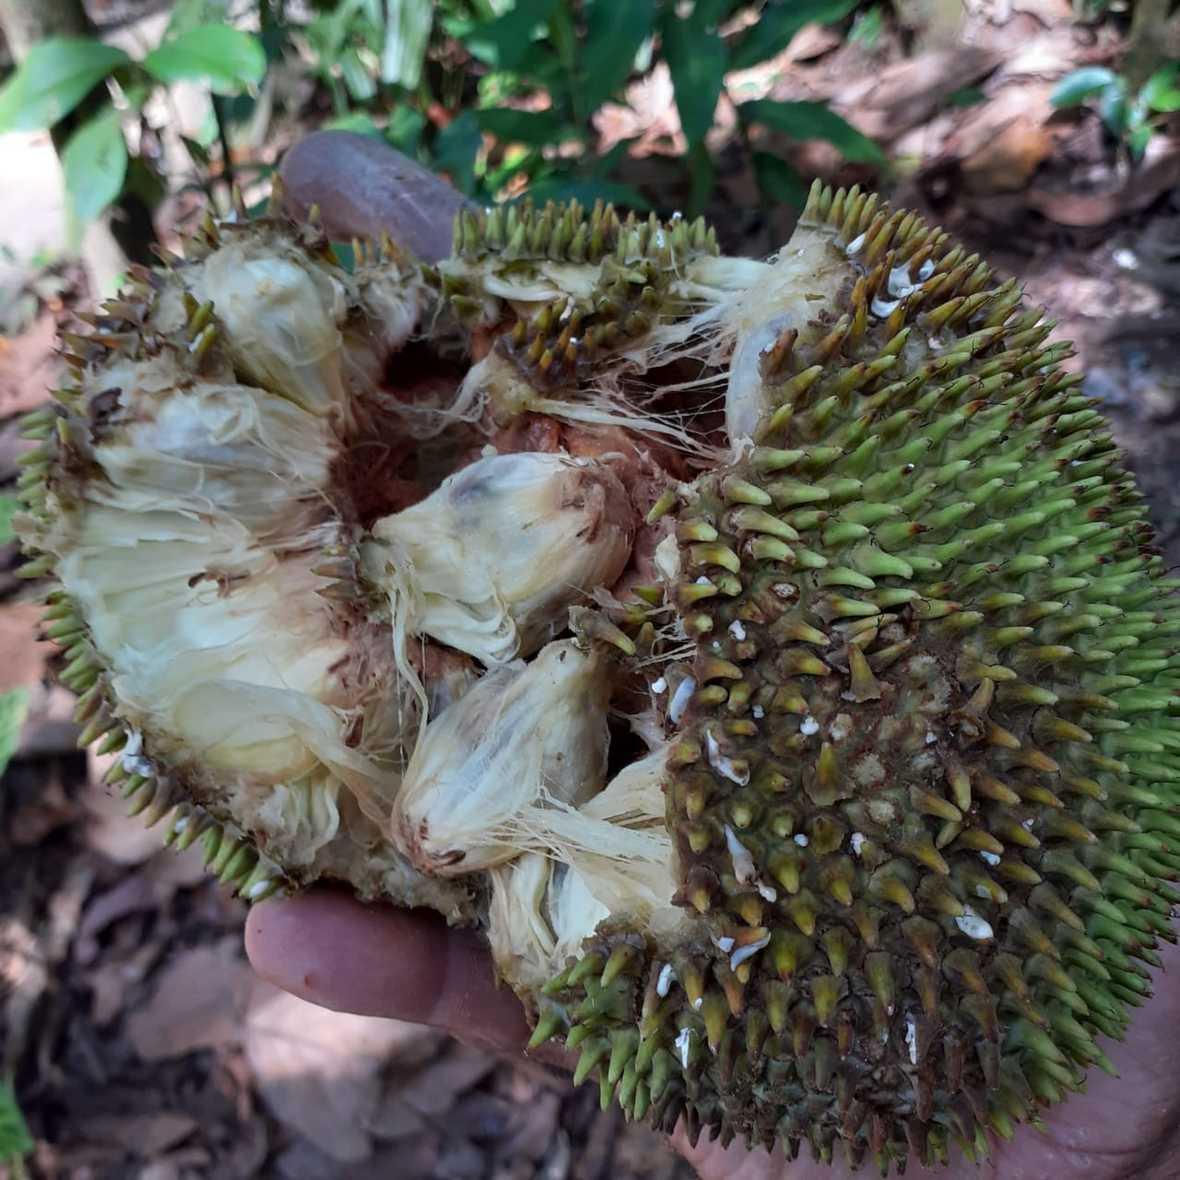 Spiky green fruit broken open to reveal fibrous white insides